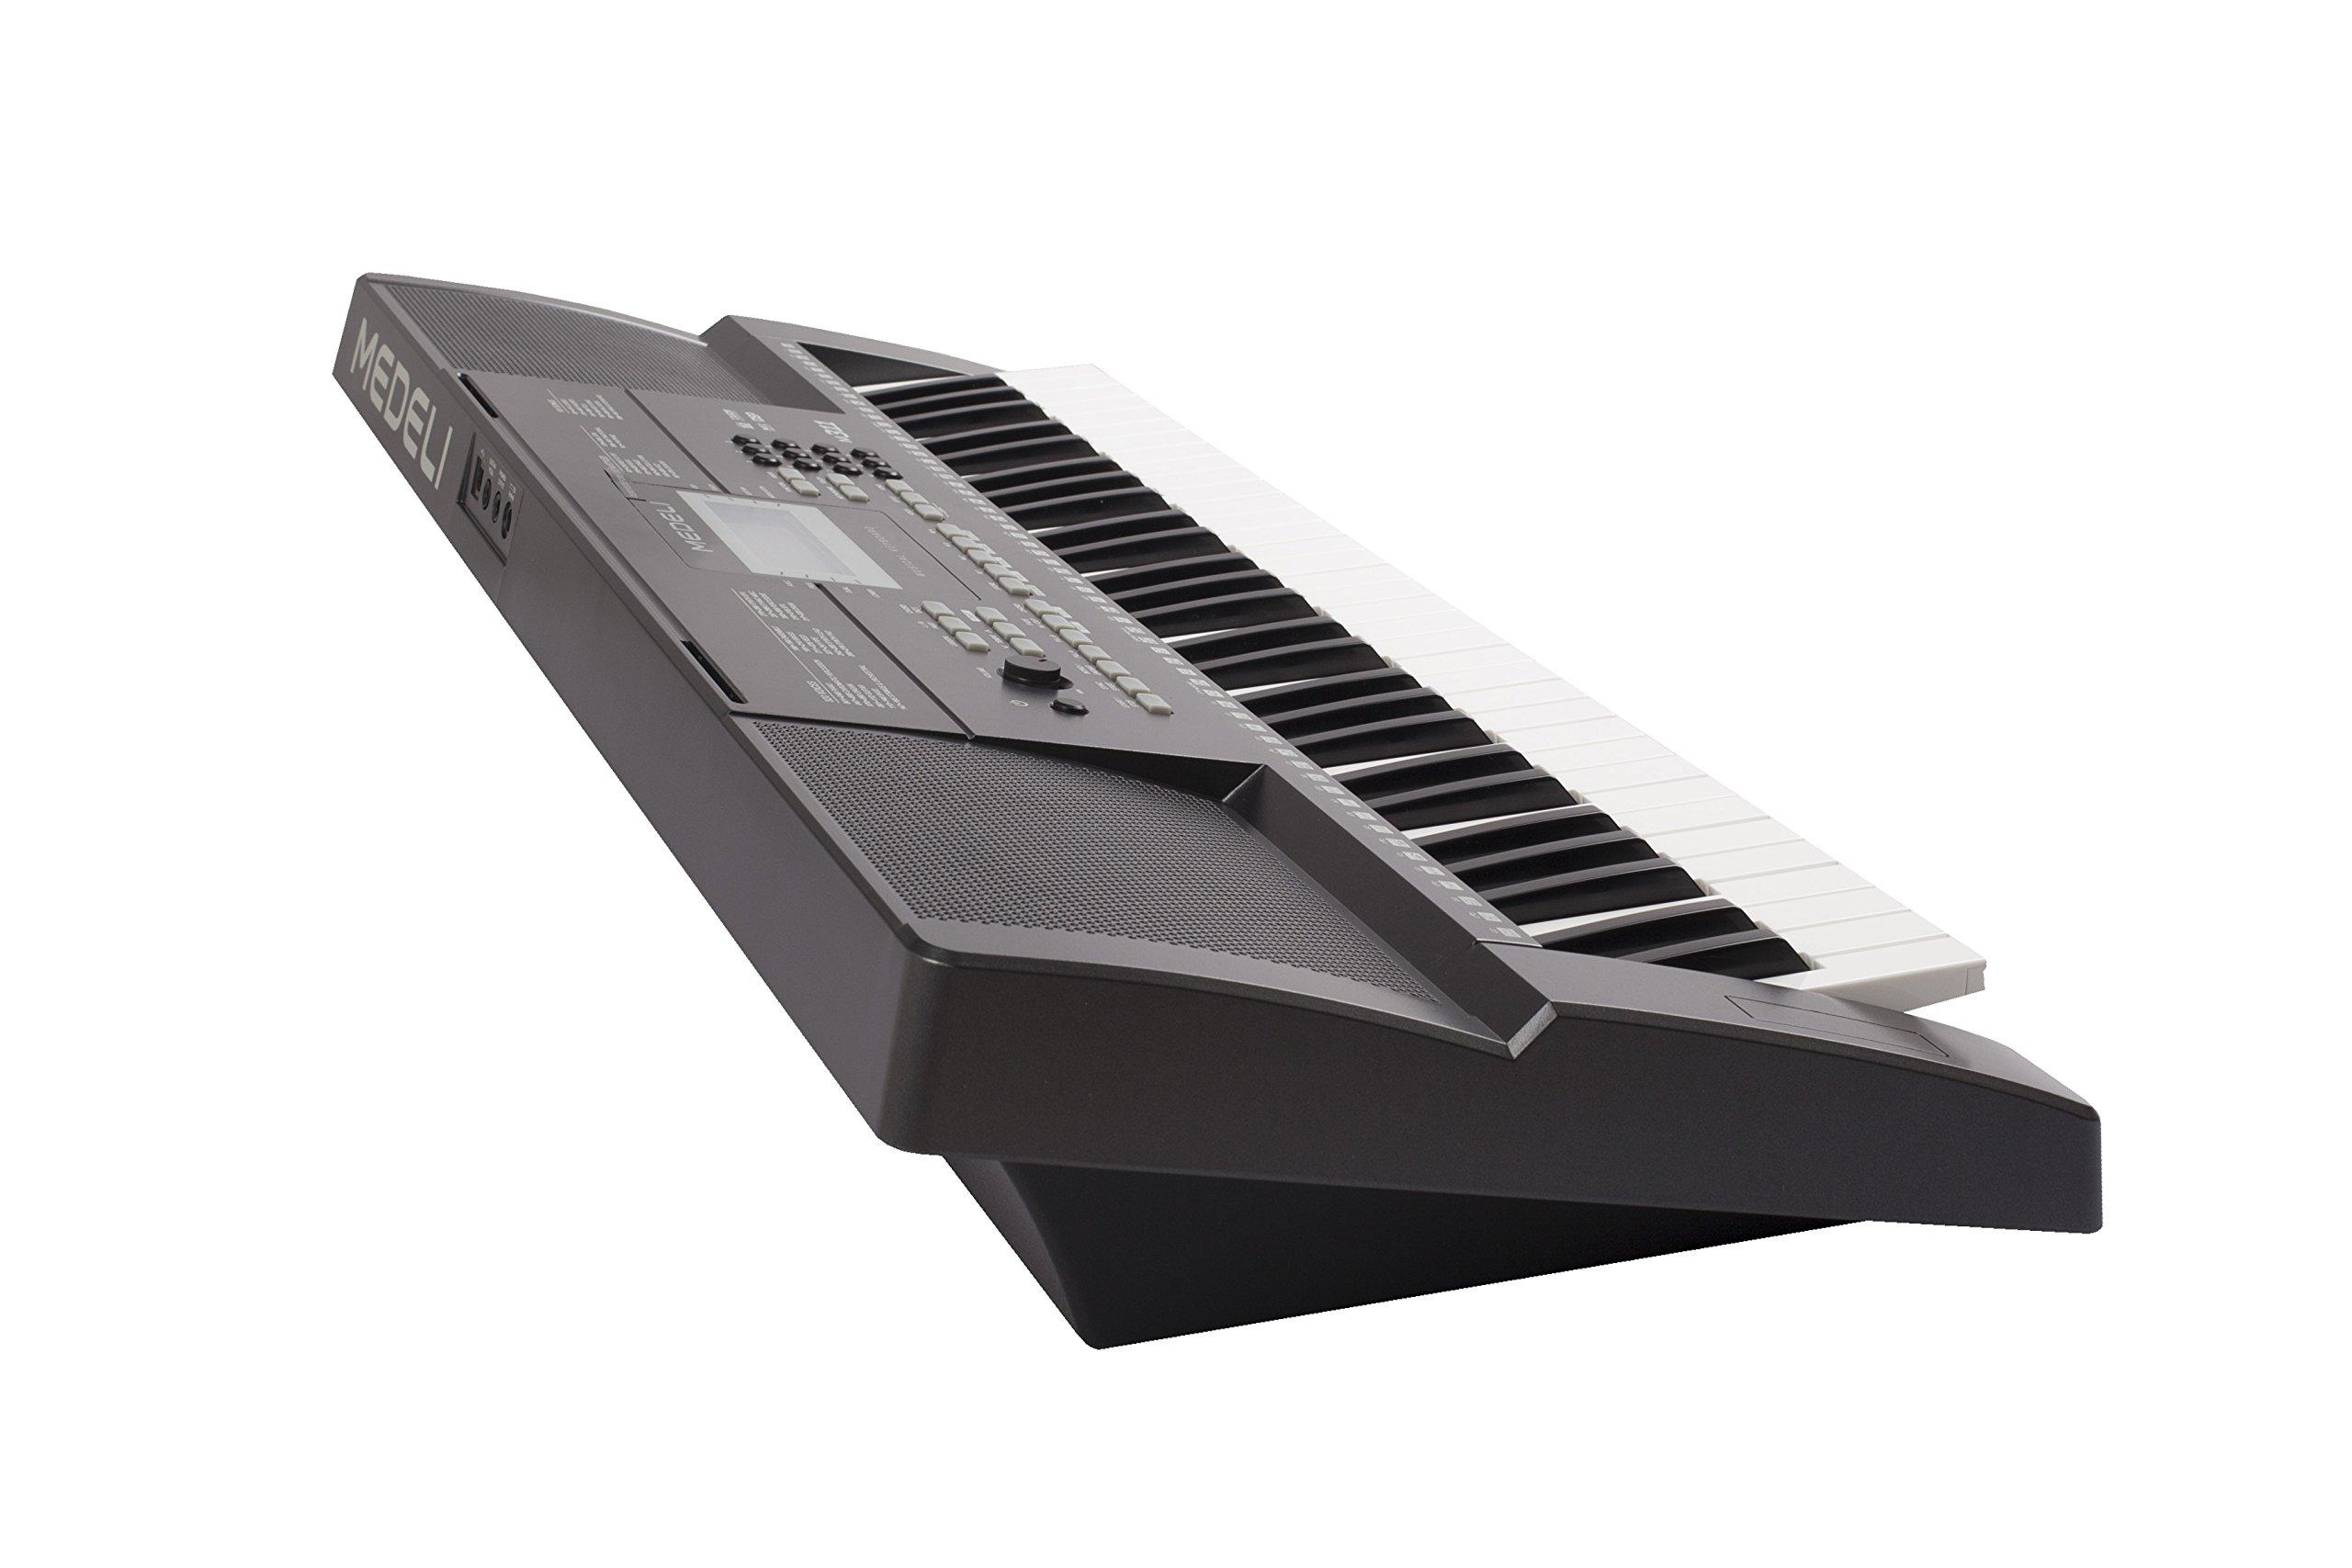 Medeli M311 Electronic Keyboard by Medeli (Image #8)